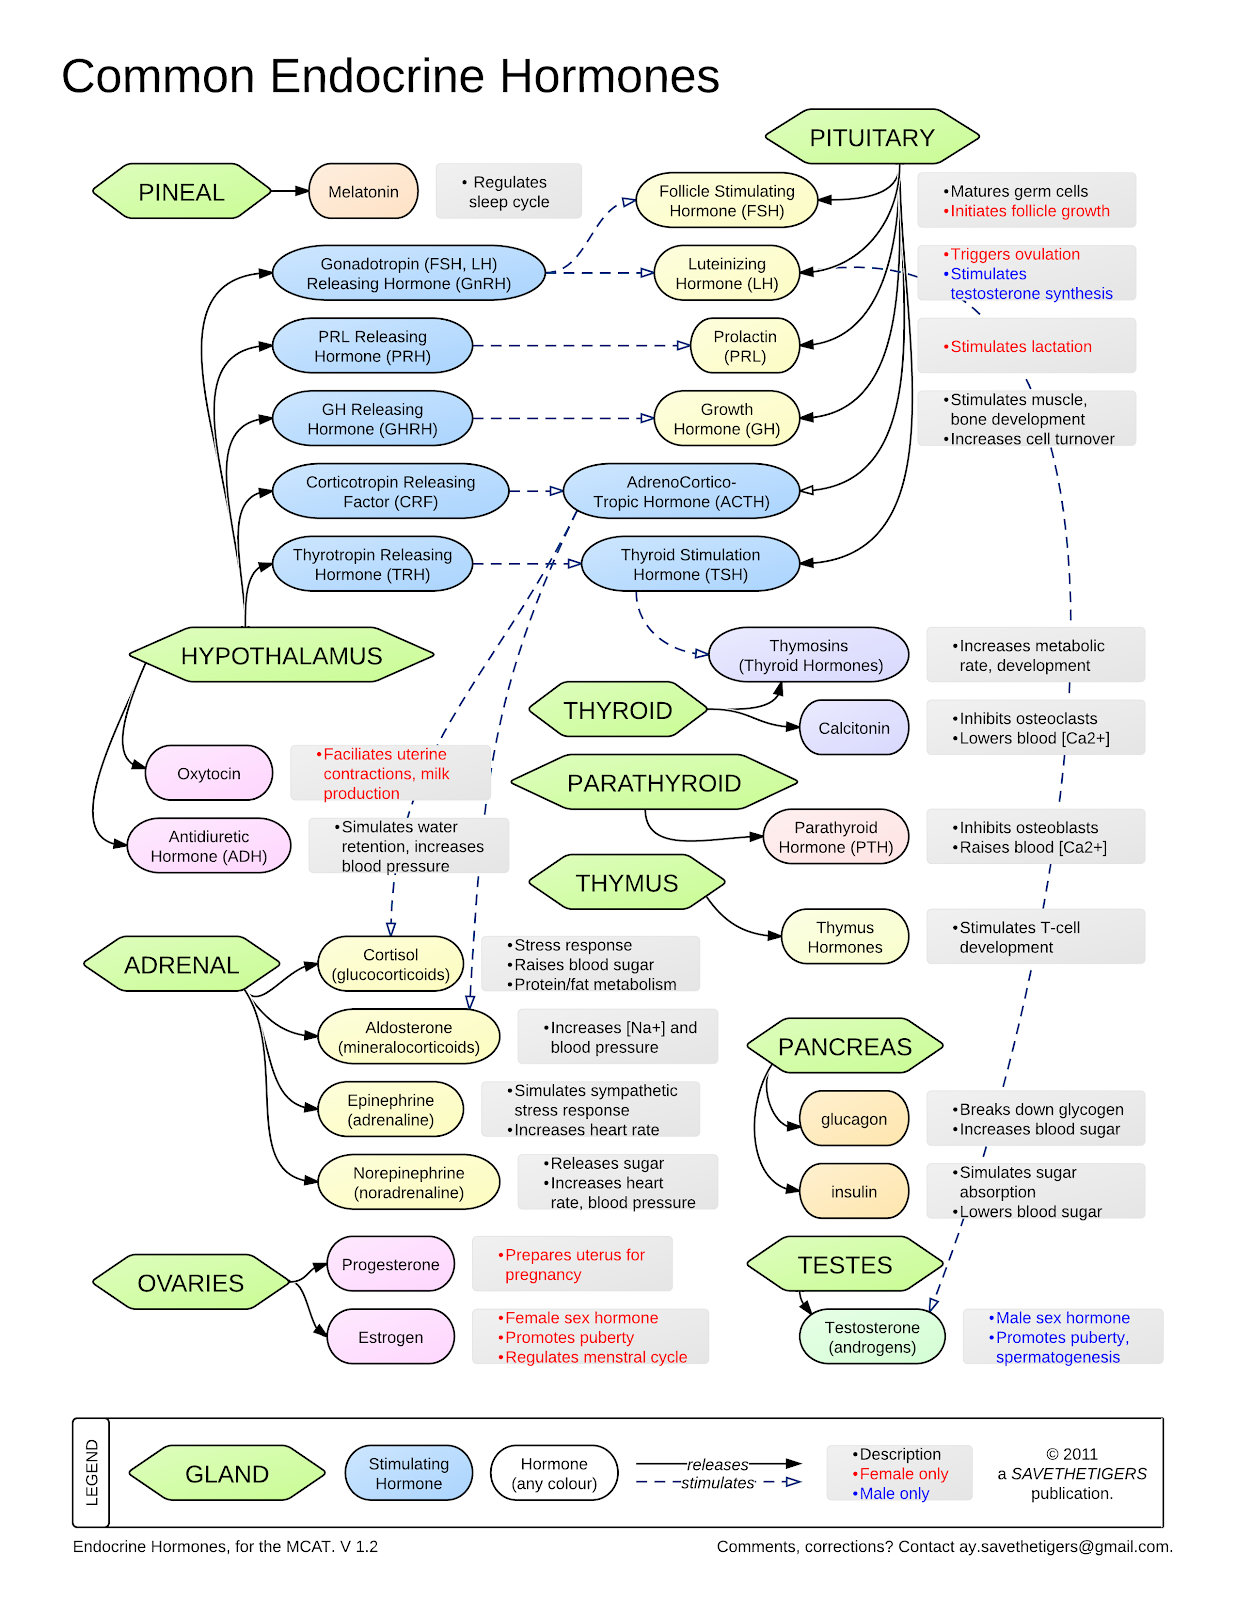 Common Endocrine Hormones On Meducation